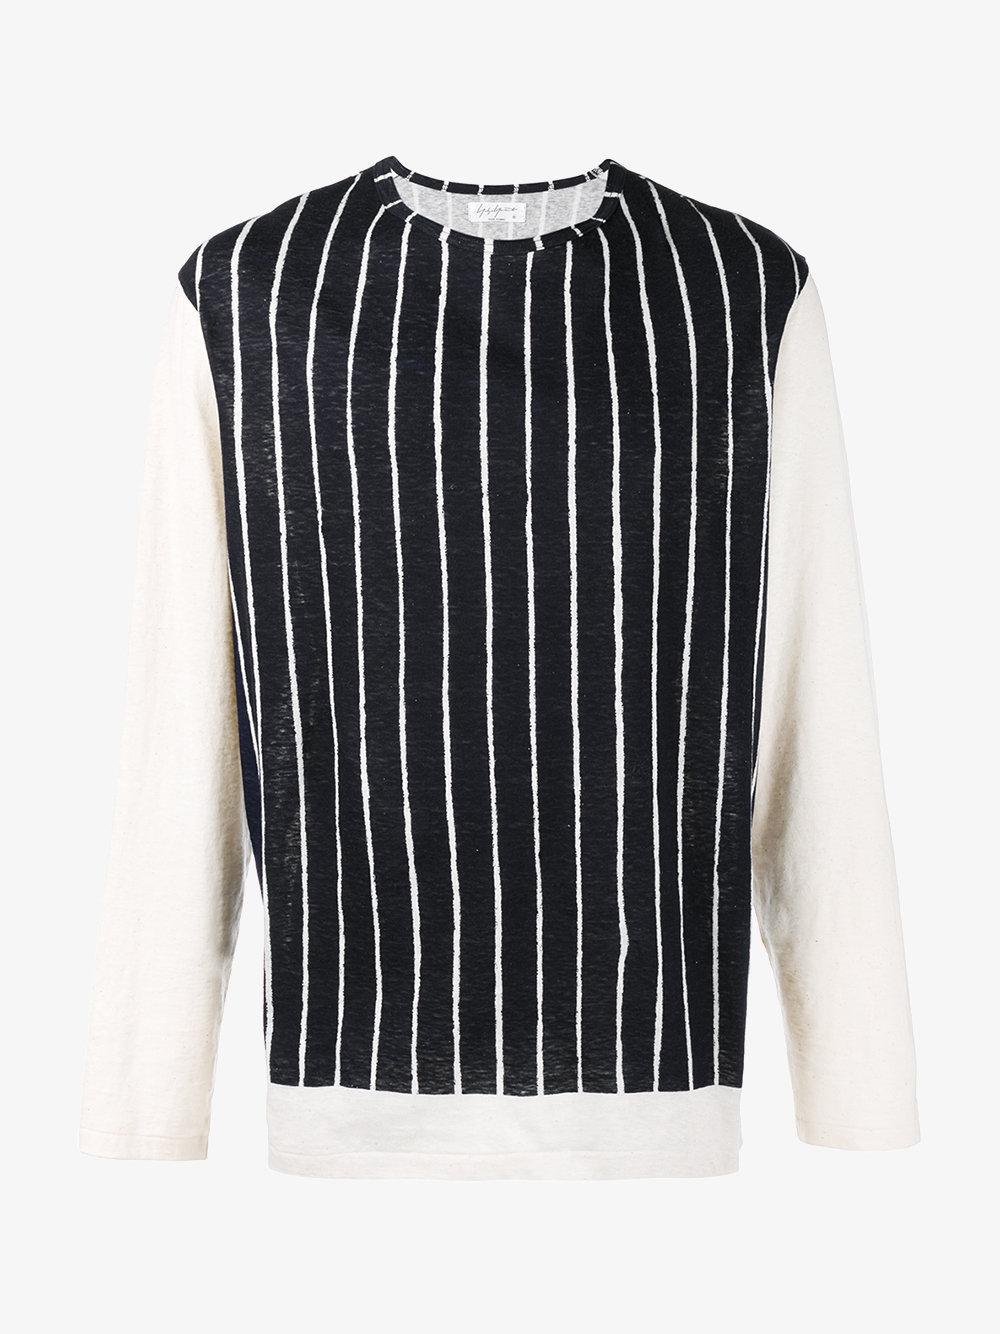 Yohji yamamoto striped long sleeve t shirt in blue for men for Blue and white striped long sleeve t shirt